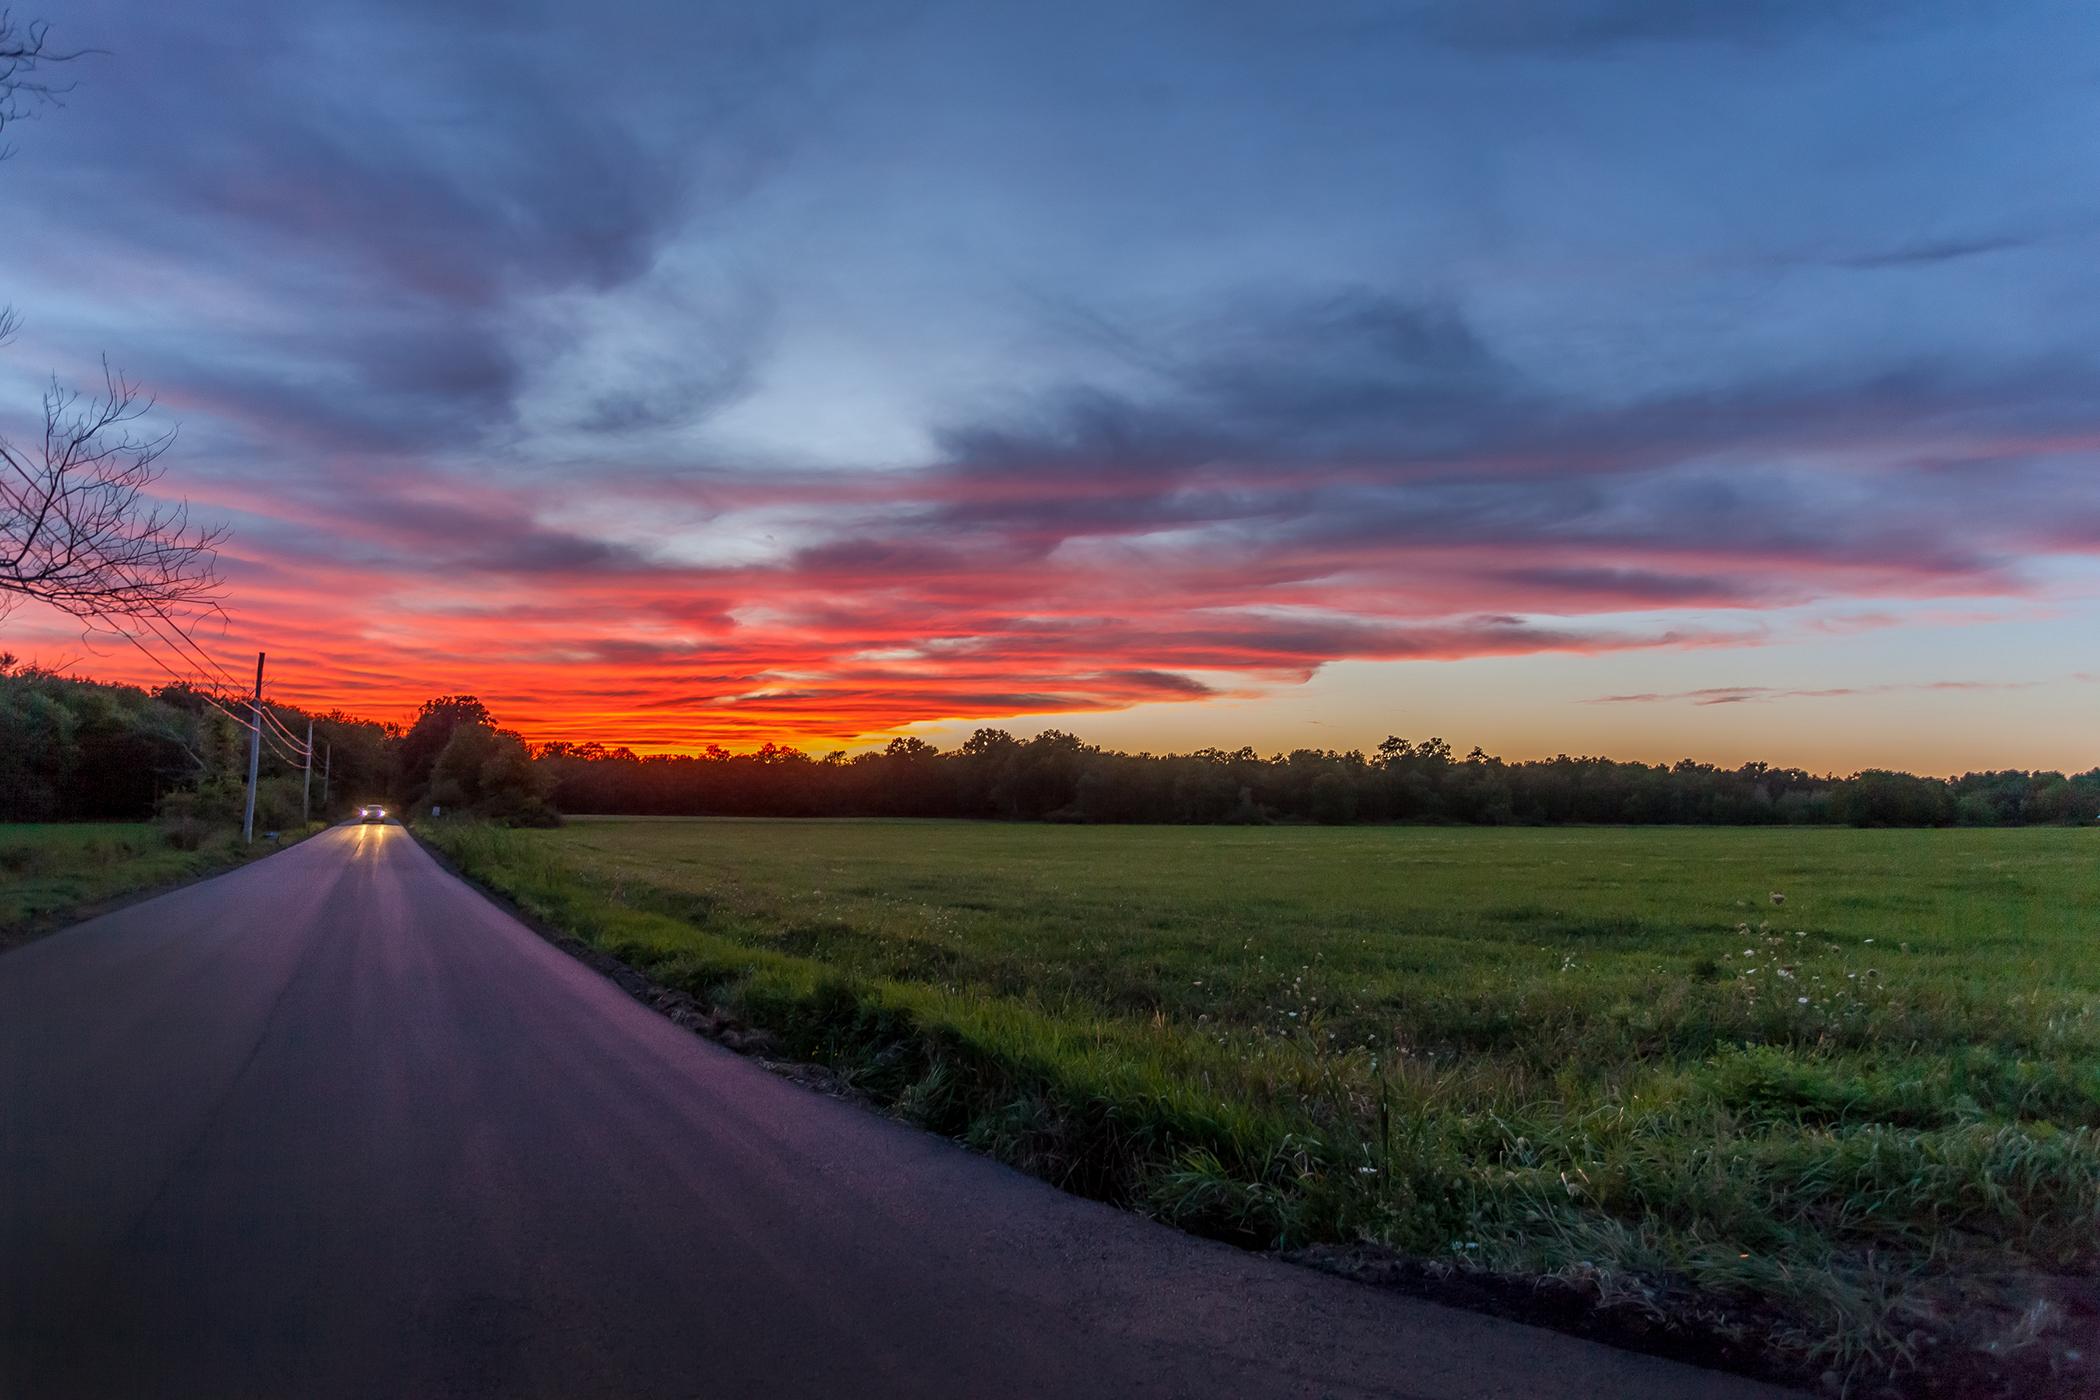 sunset2_sm.jpg